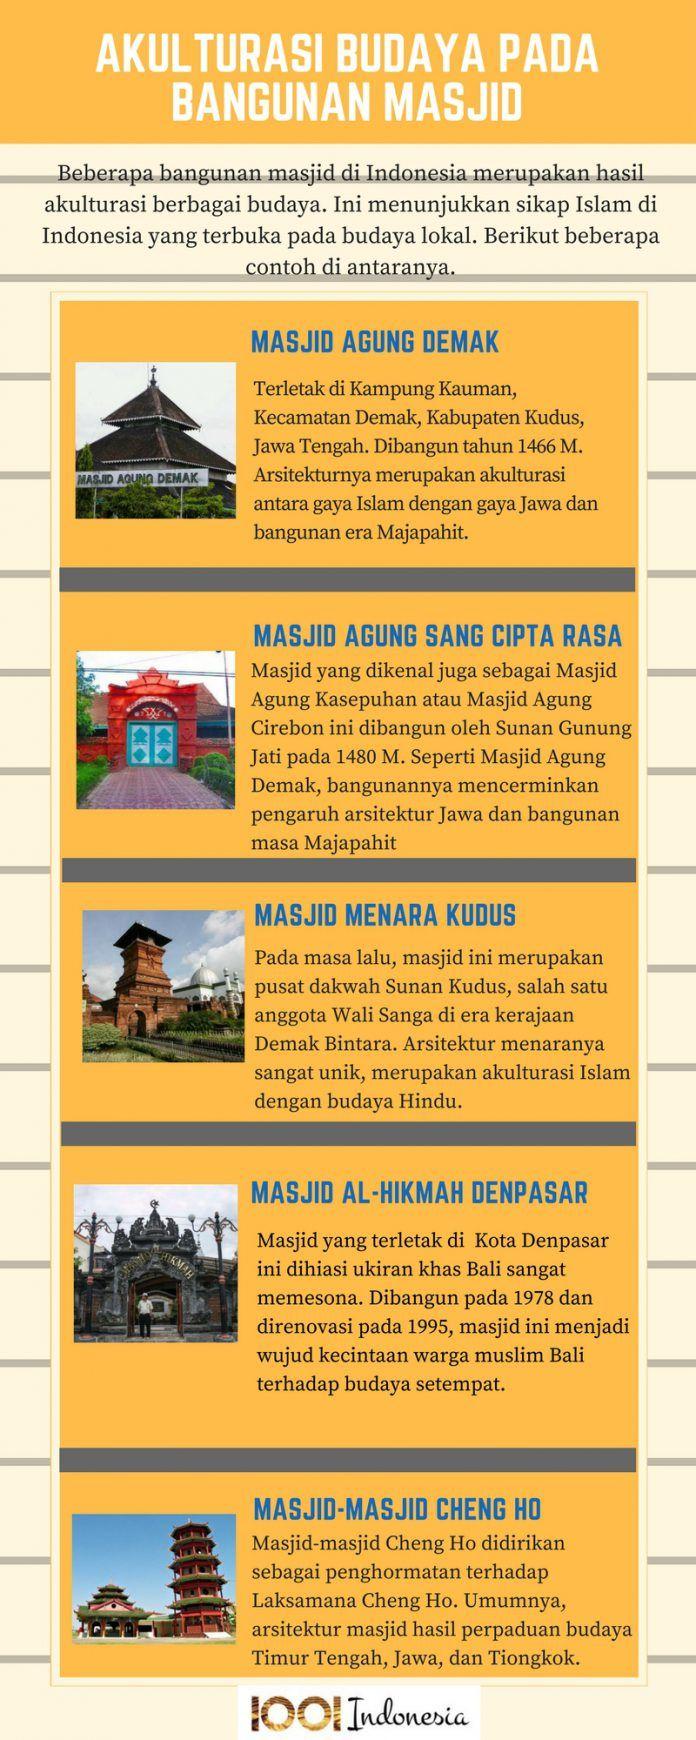 Contoh Budaya Islam : contoh, budaya, islam, Akulturasi, Budaya, Bangunan, Masjid, Indonesia, Bangunan,, Indonesia,